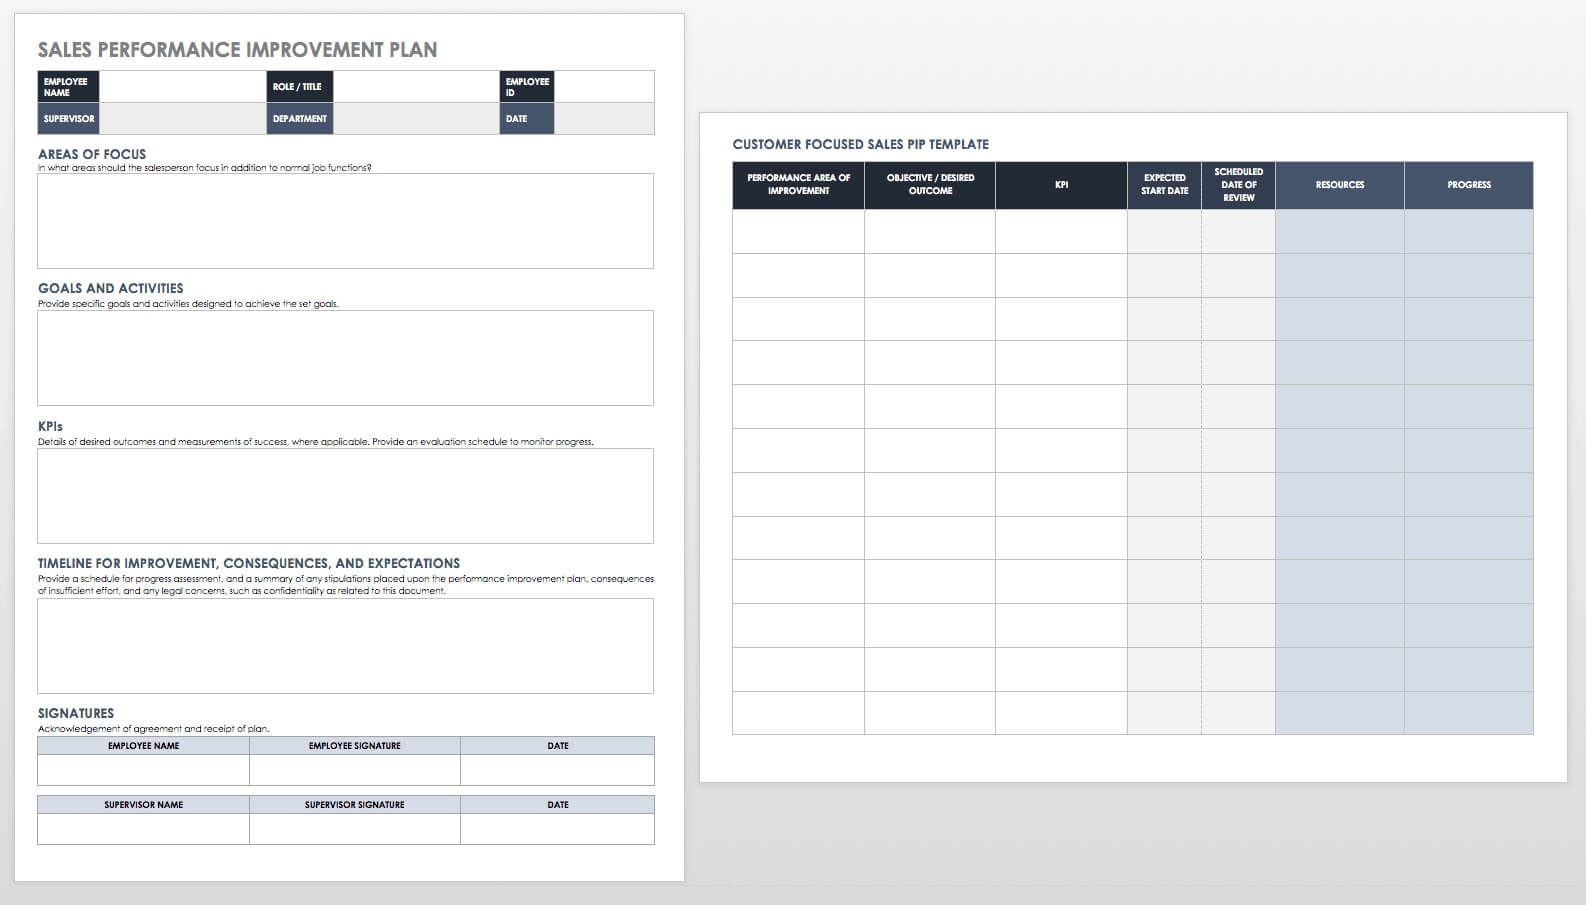 Performance Improvement Plan Templates | Smartsheet Pertaining To Improvement Report Template